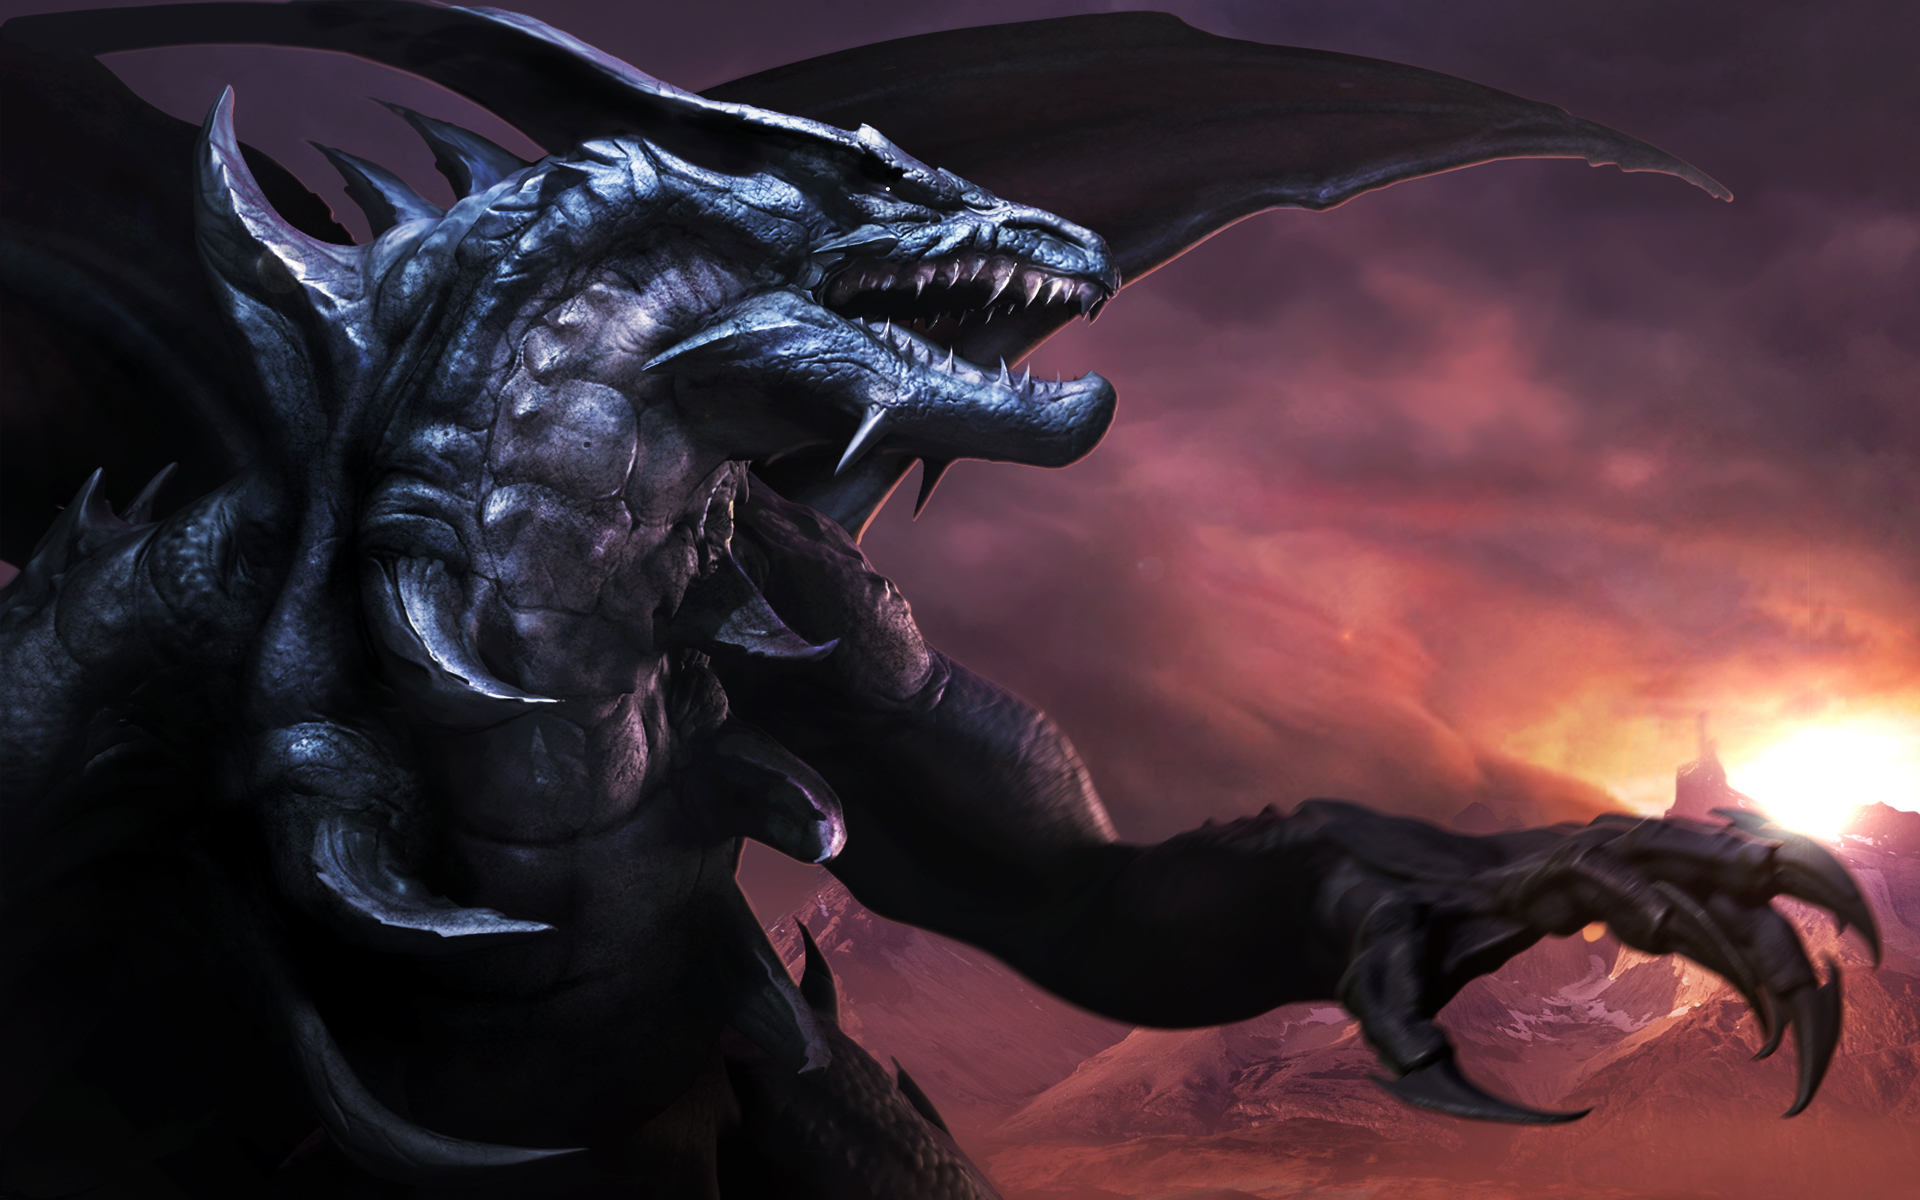 Dragon HD Wallpaper | Background Image | 1920x1200 | ID